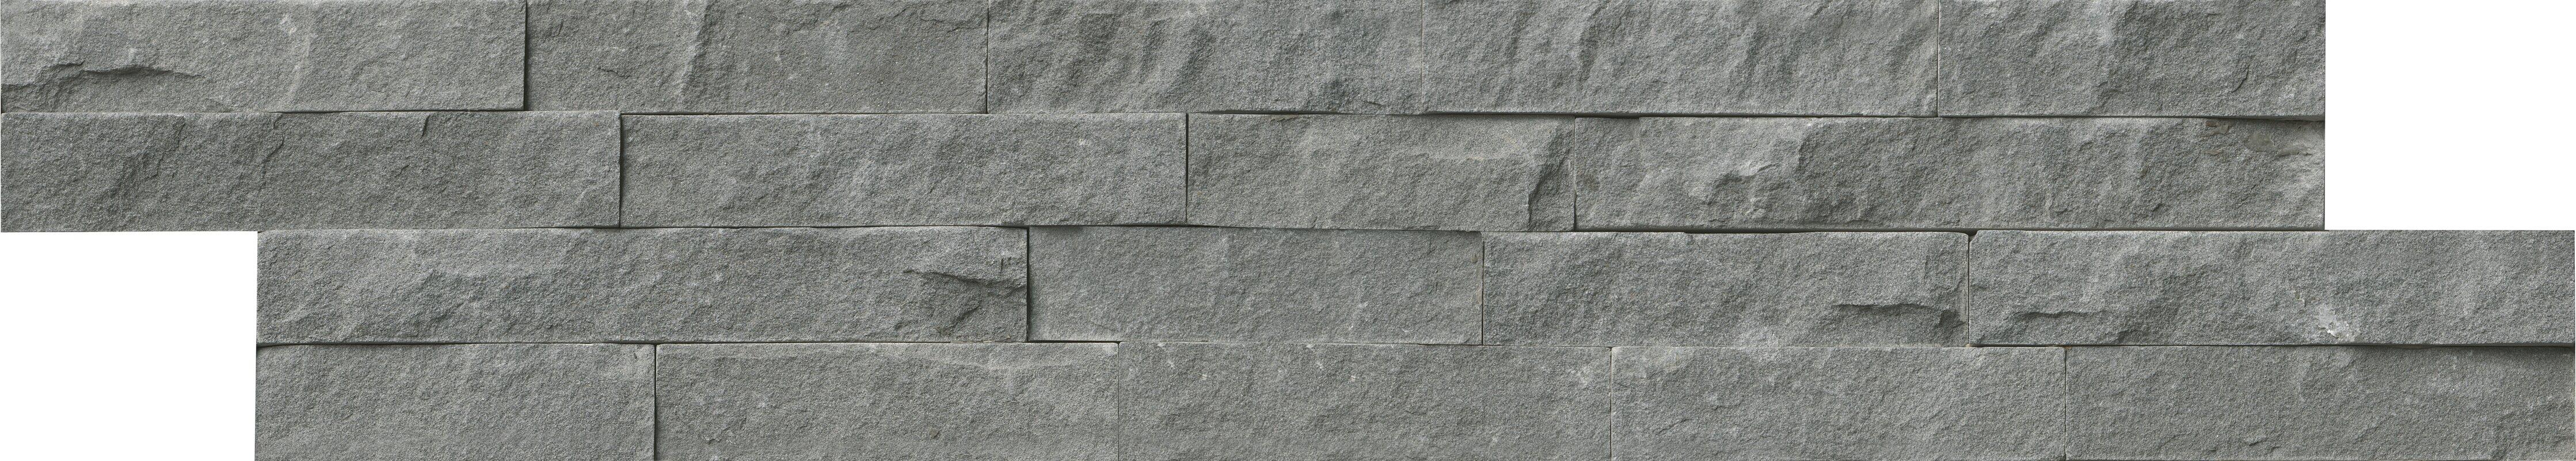 Msi mountain bluestone 6 x 24 sandstone splitface tile in blue mountain bluestone 6 x 24 sandstone splitface tile dailygadgetfo Images